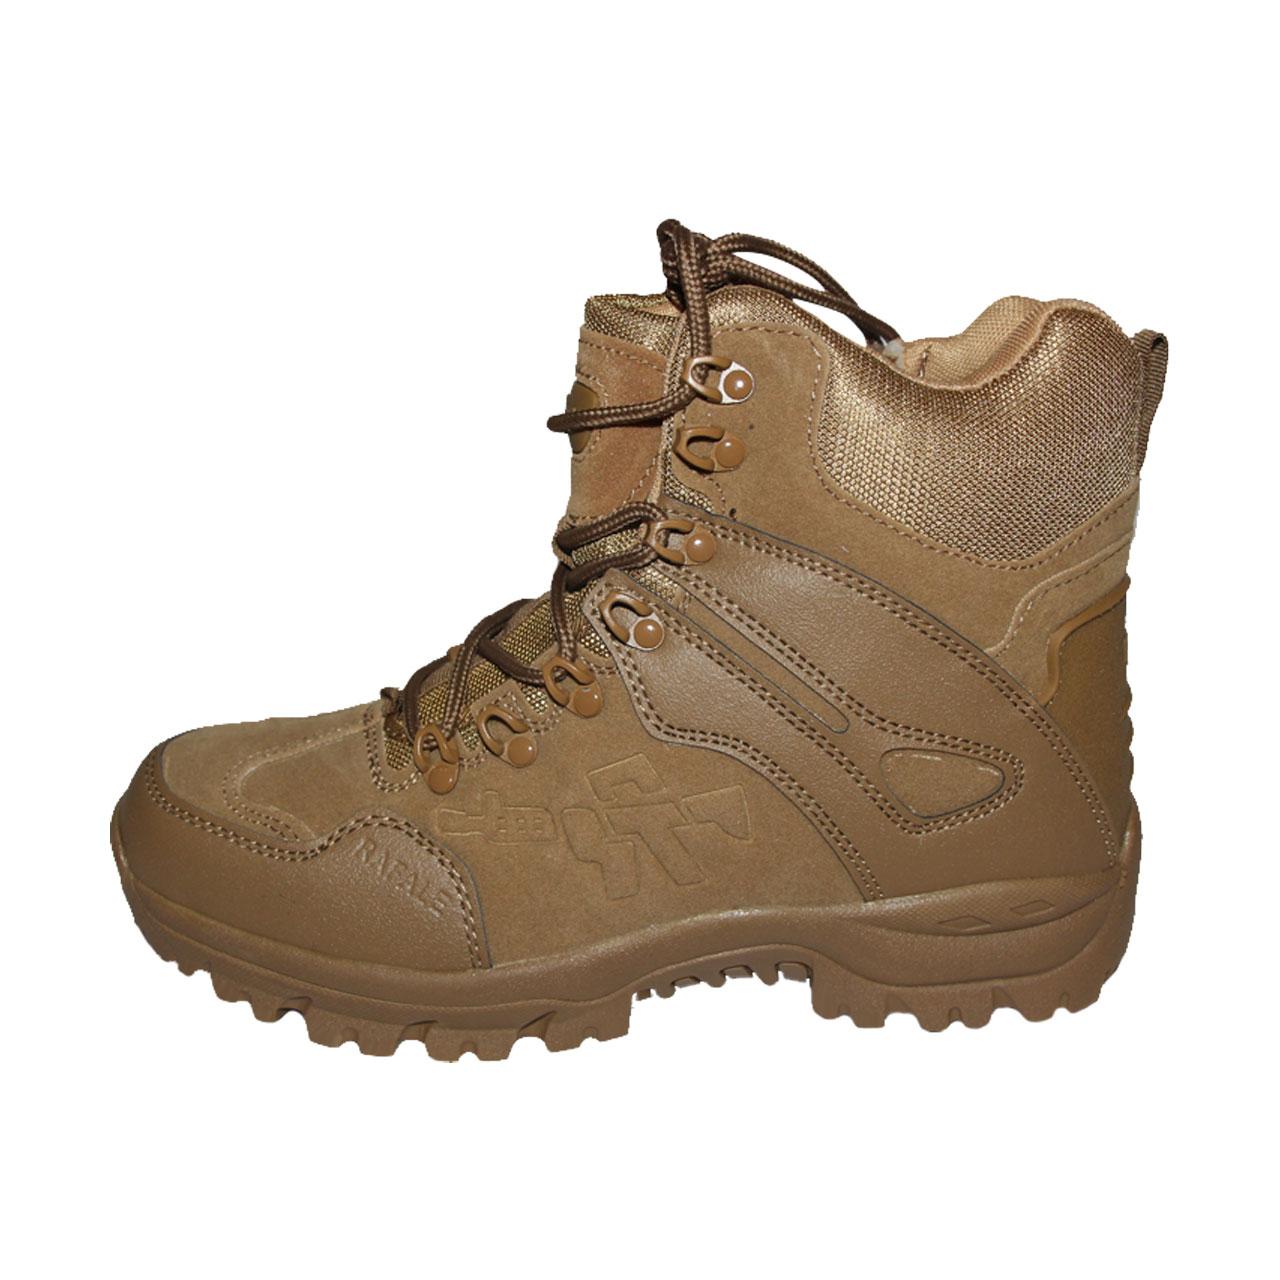 قیمت کفش کوهنوردی مردانه رافائل مدل IGD